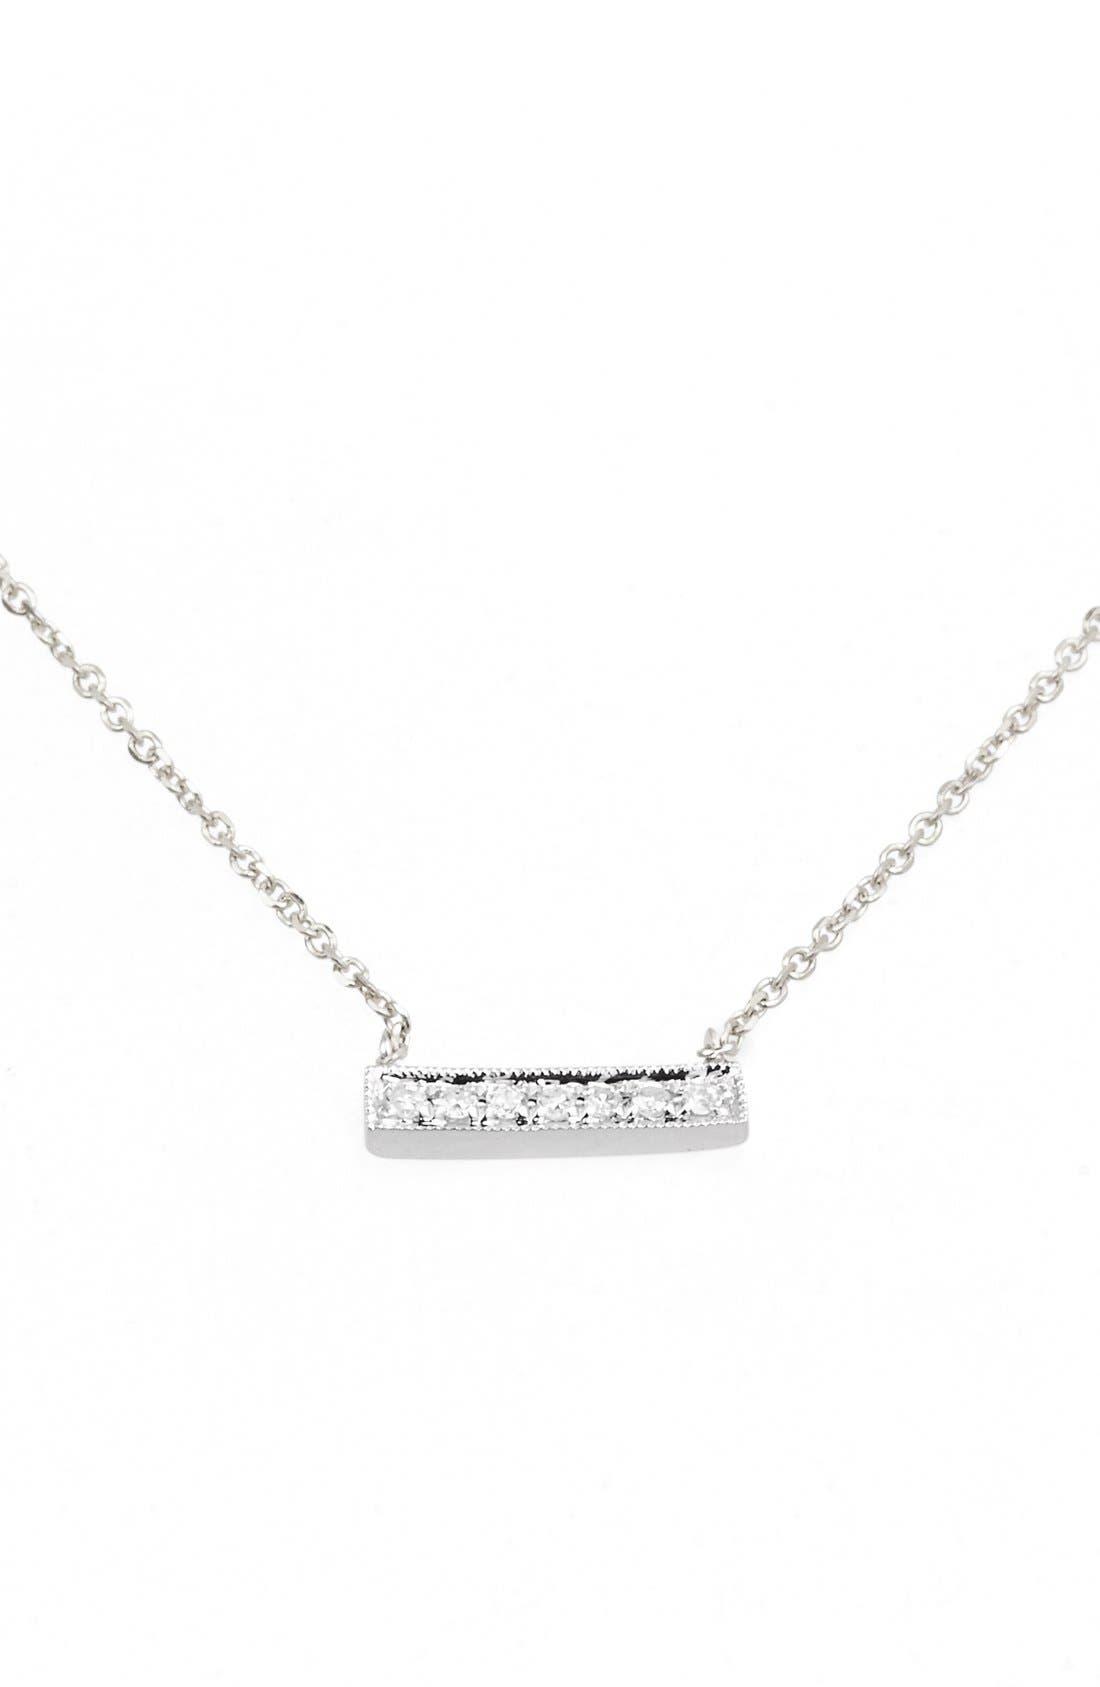 DANA REBECCA DESIGNS Sylvie Rose Diamond Bar Pendant Necklace